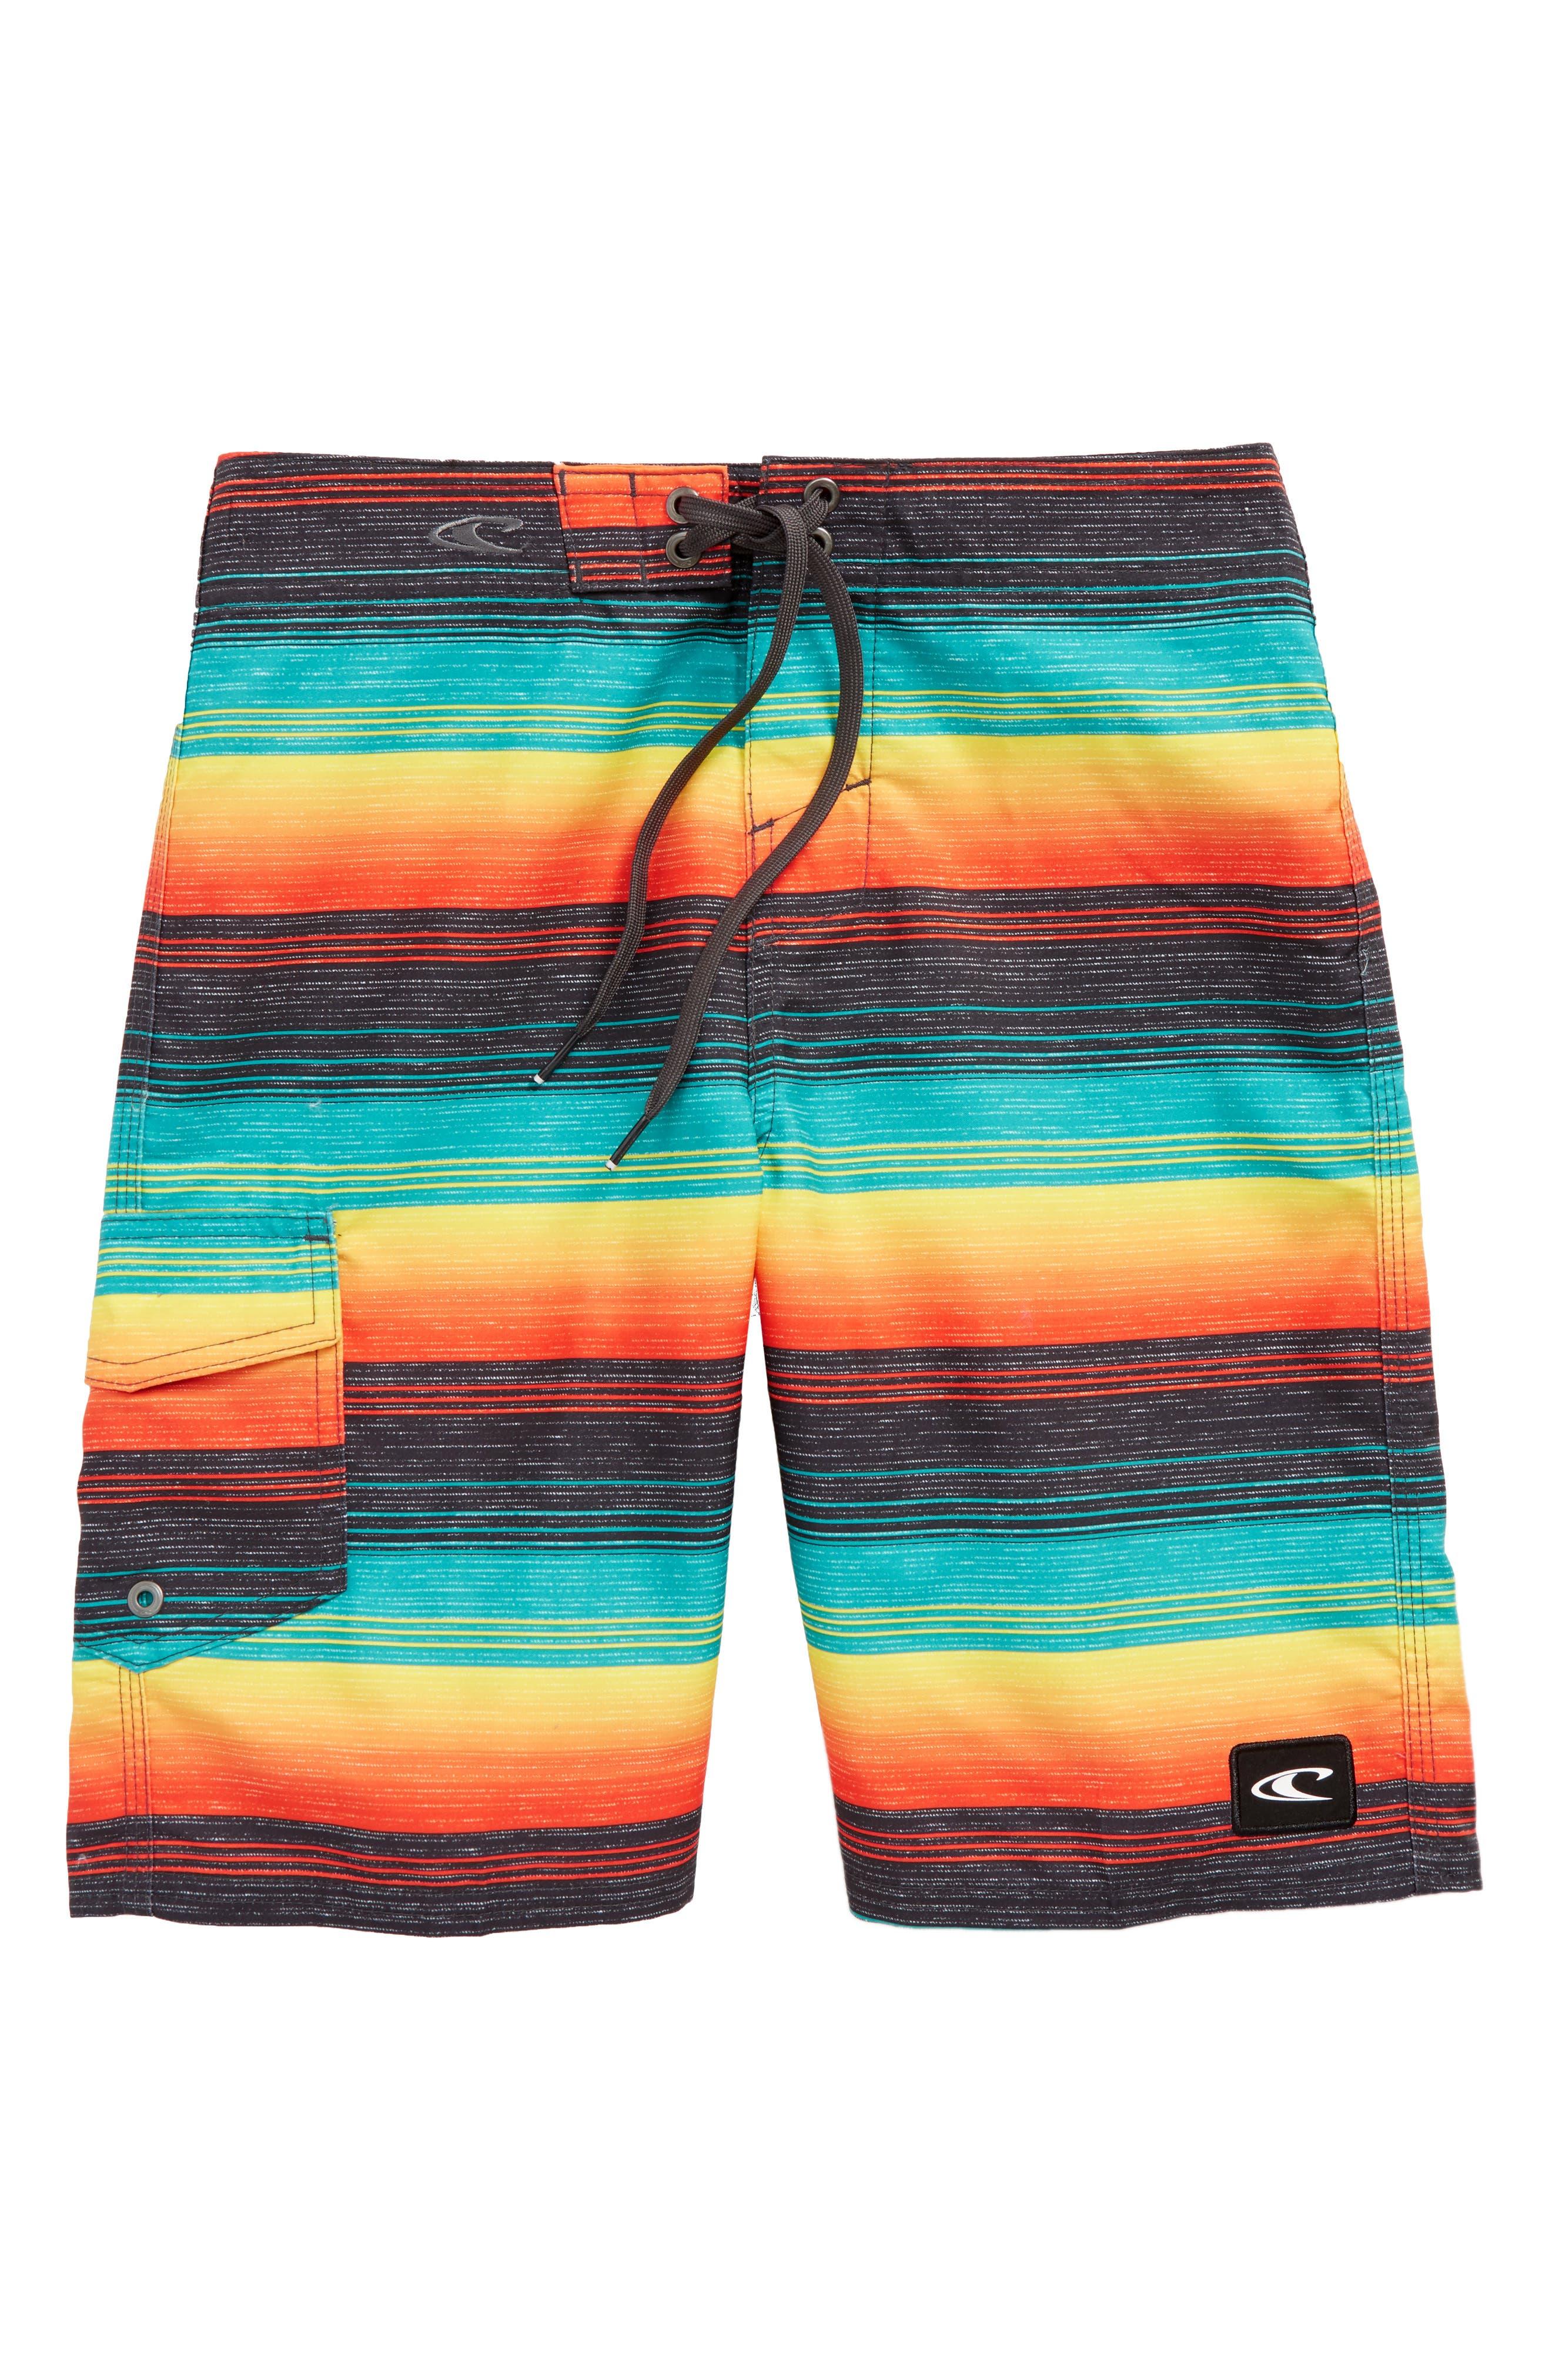 O'NEILL Santa Cruz Stripe Board Shorts, Main, color, 001